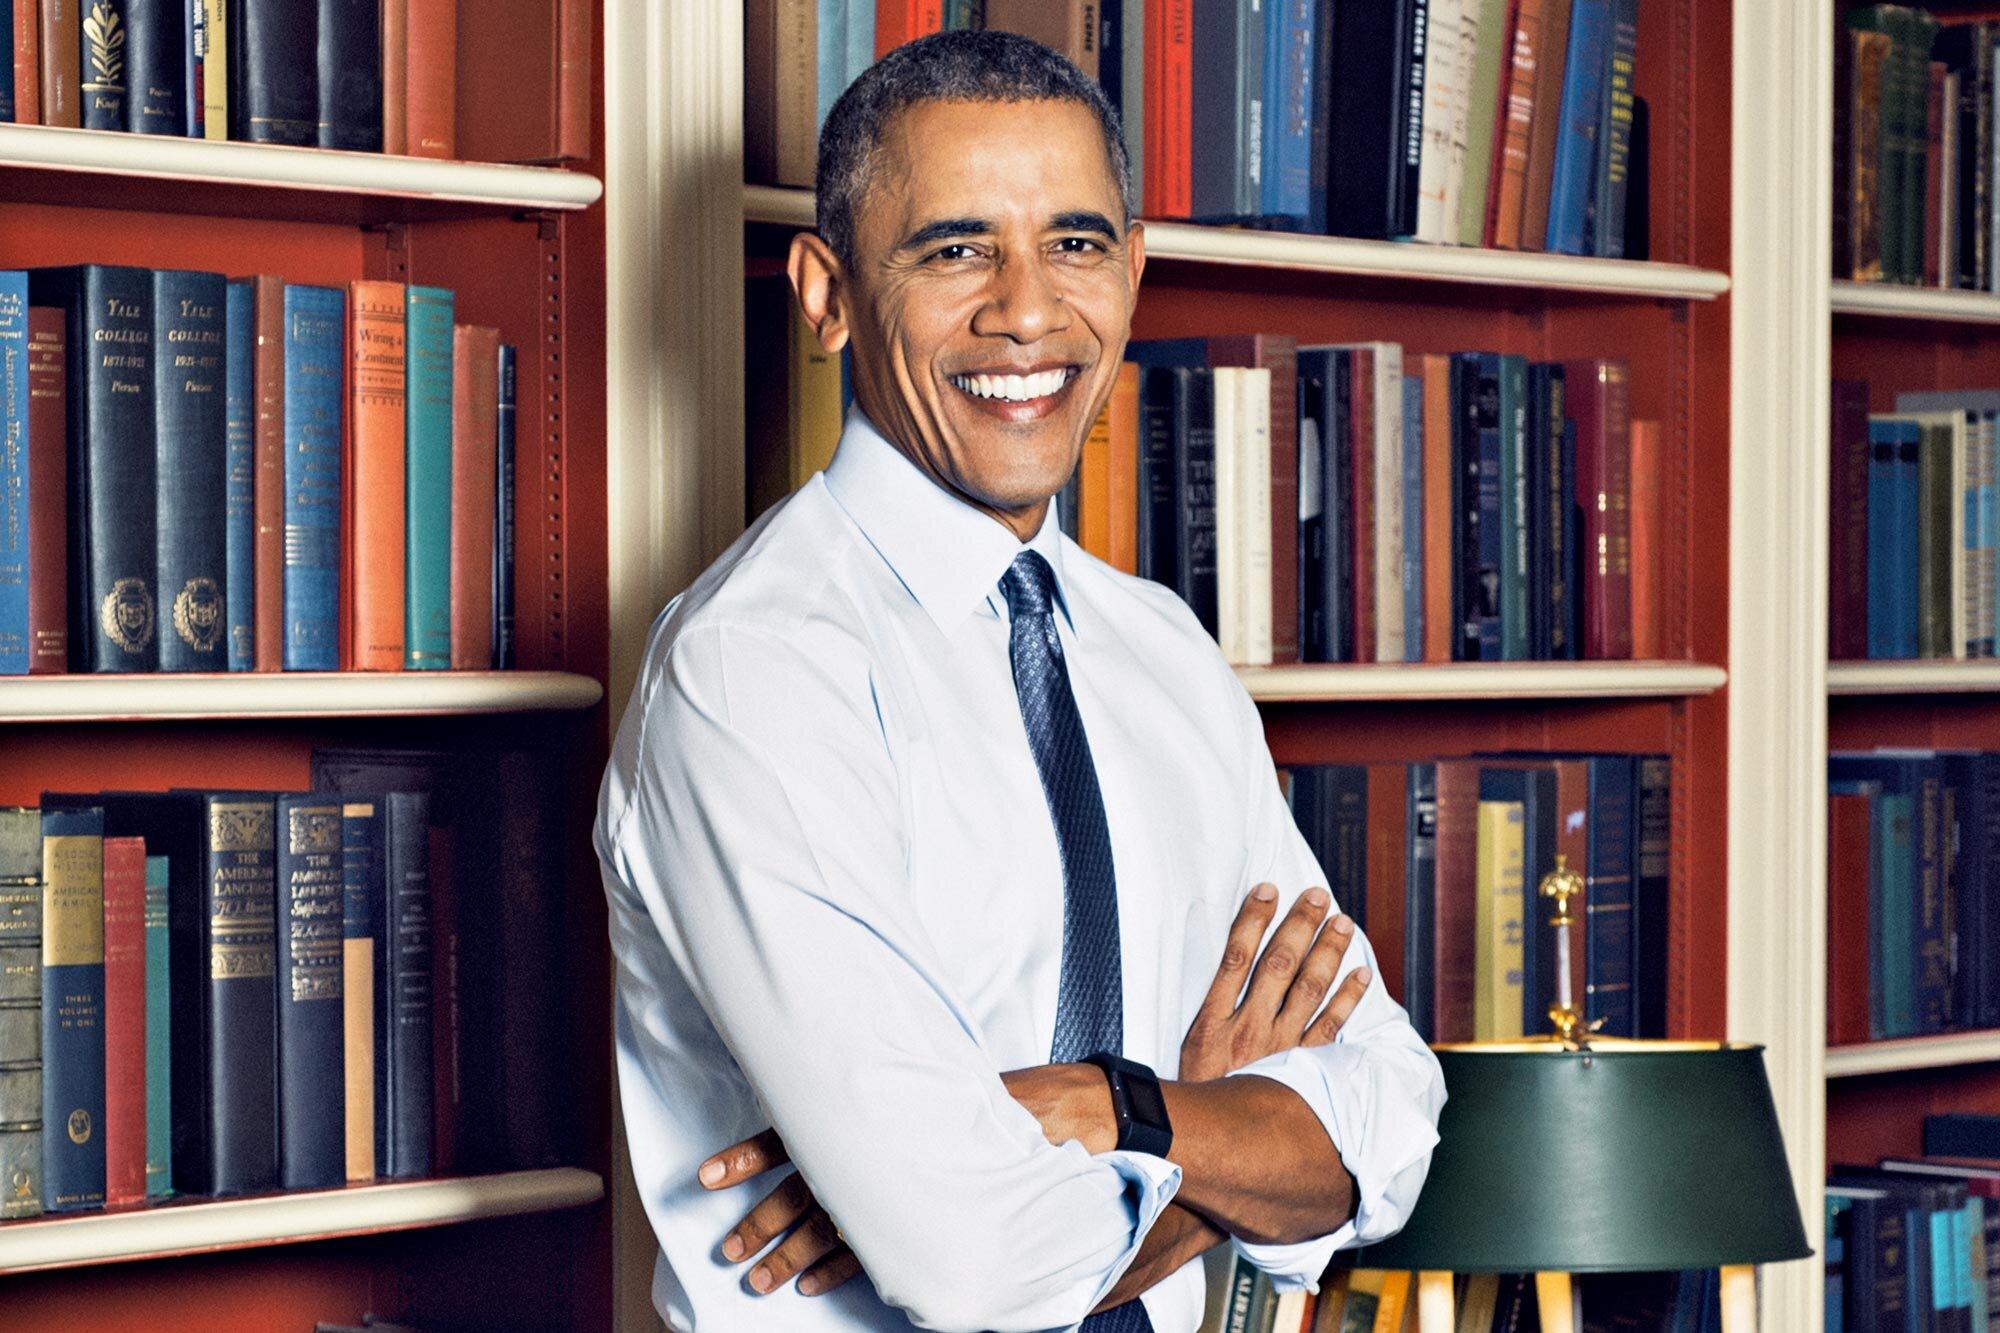 Barack Obama on writing his memoir A Promised Land | EW.com